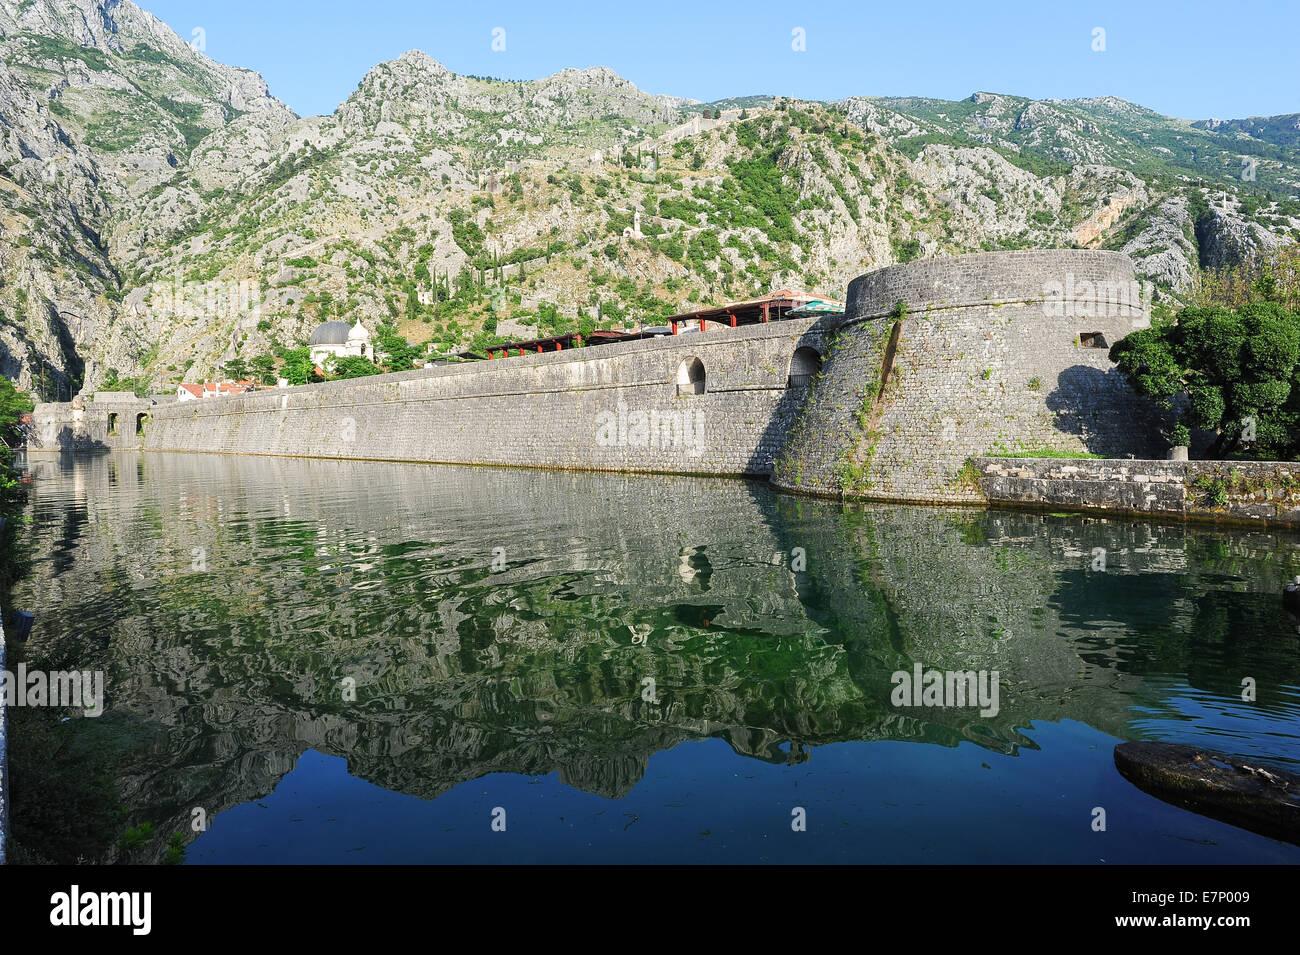 age, Balkans, bay, bocche, boka, bokokotorski, building, cattaro, Europe, European, fortress, heritage, house, kotor, - Stock Image